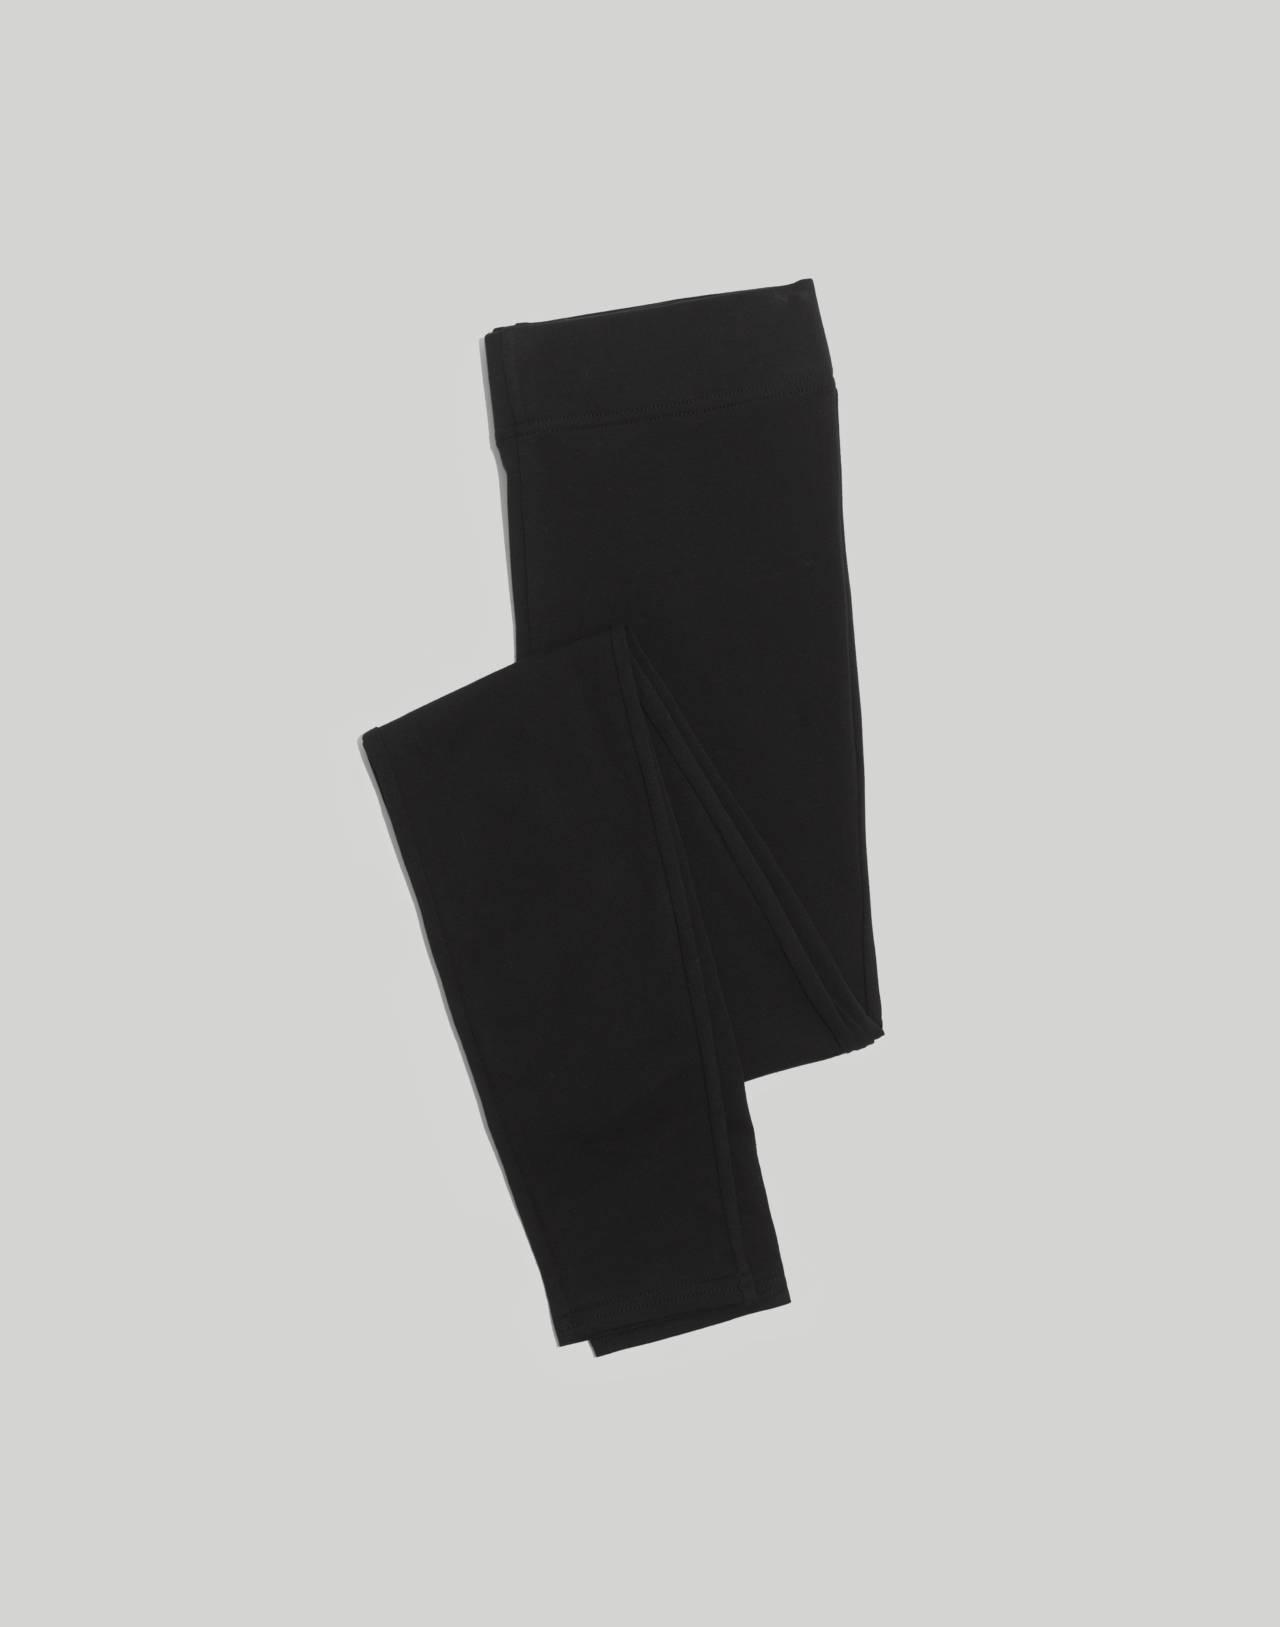 High-Rise Knit Leggings in true black image 4